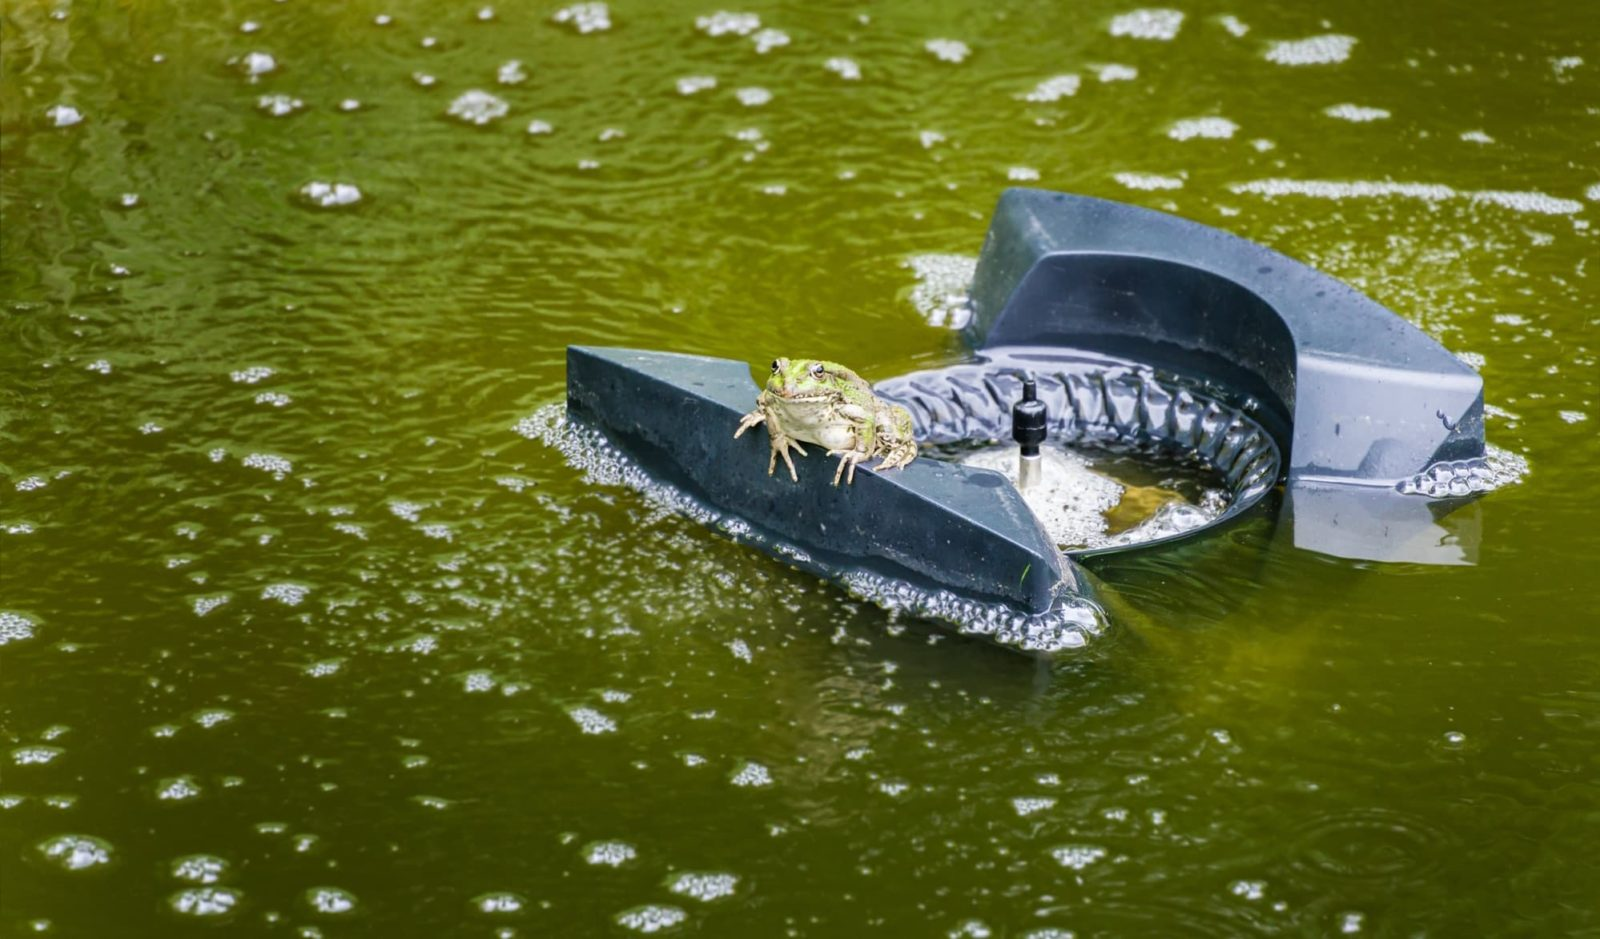 frog sat on a black pond aerator